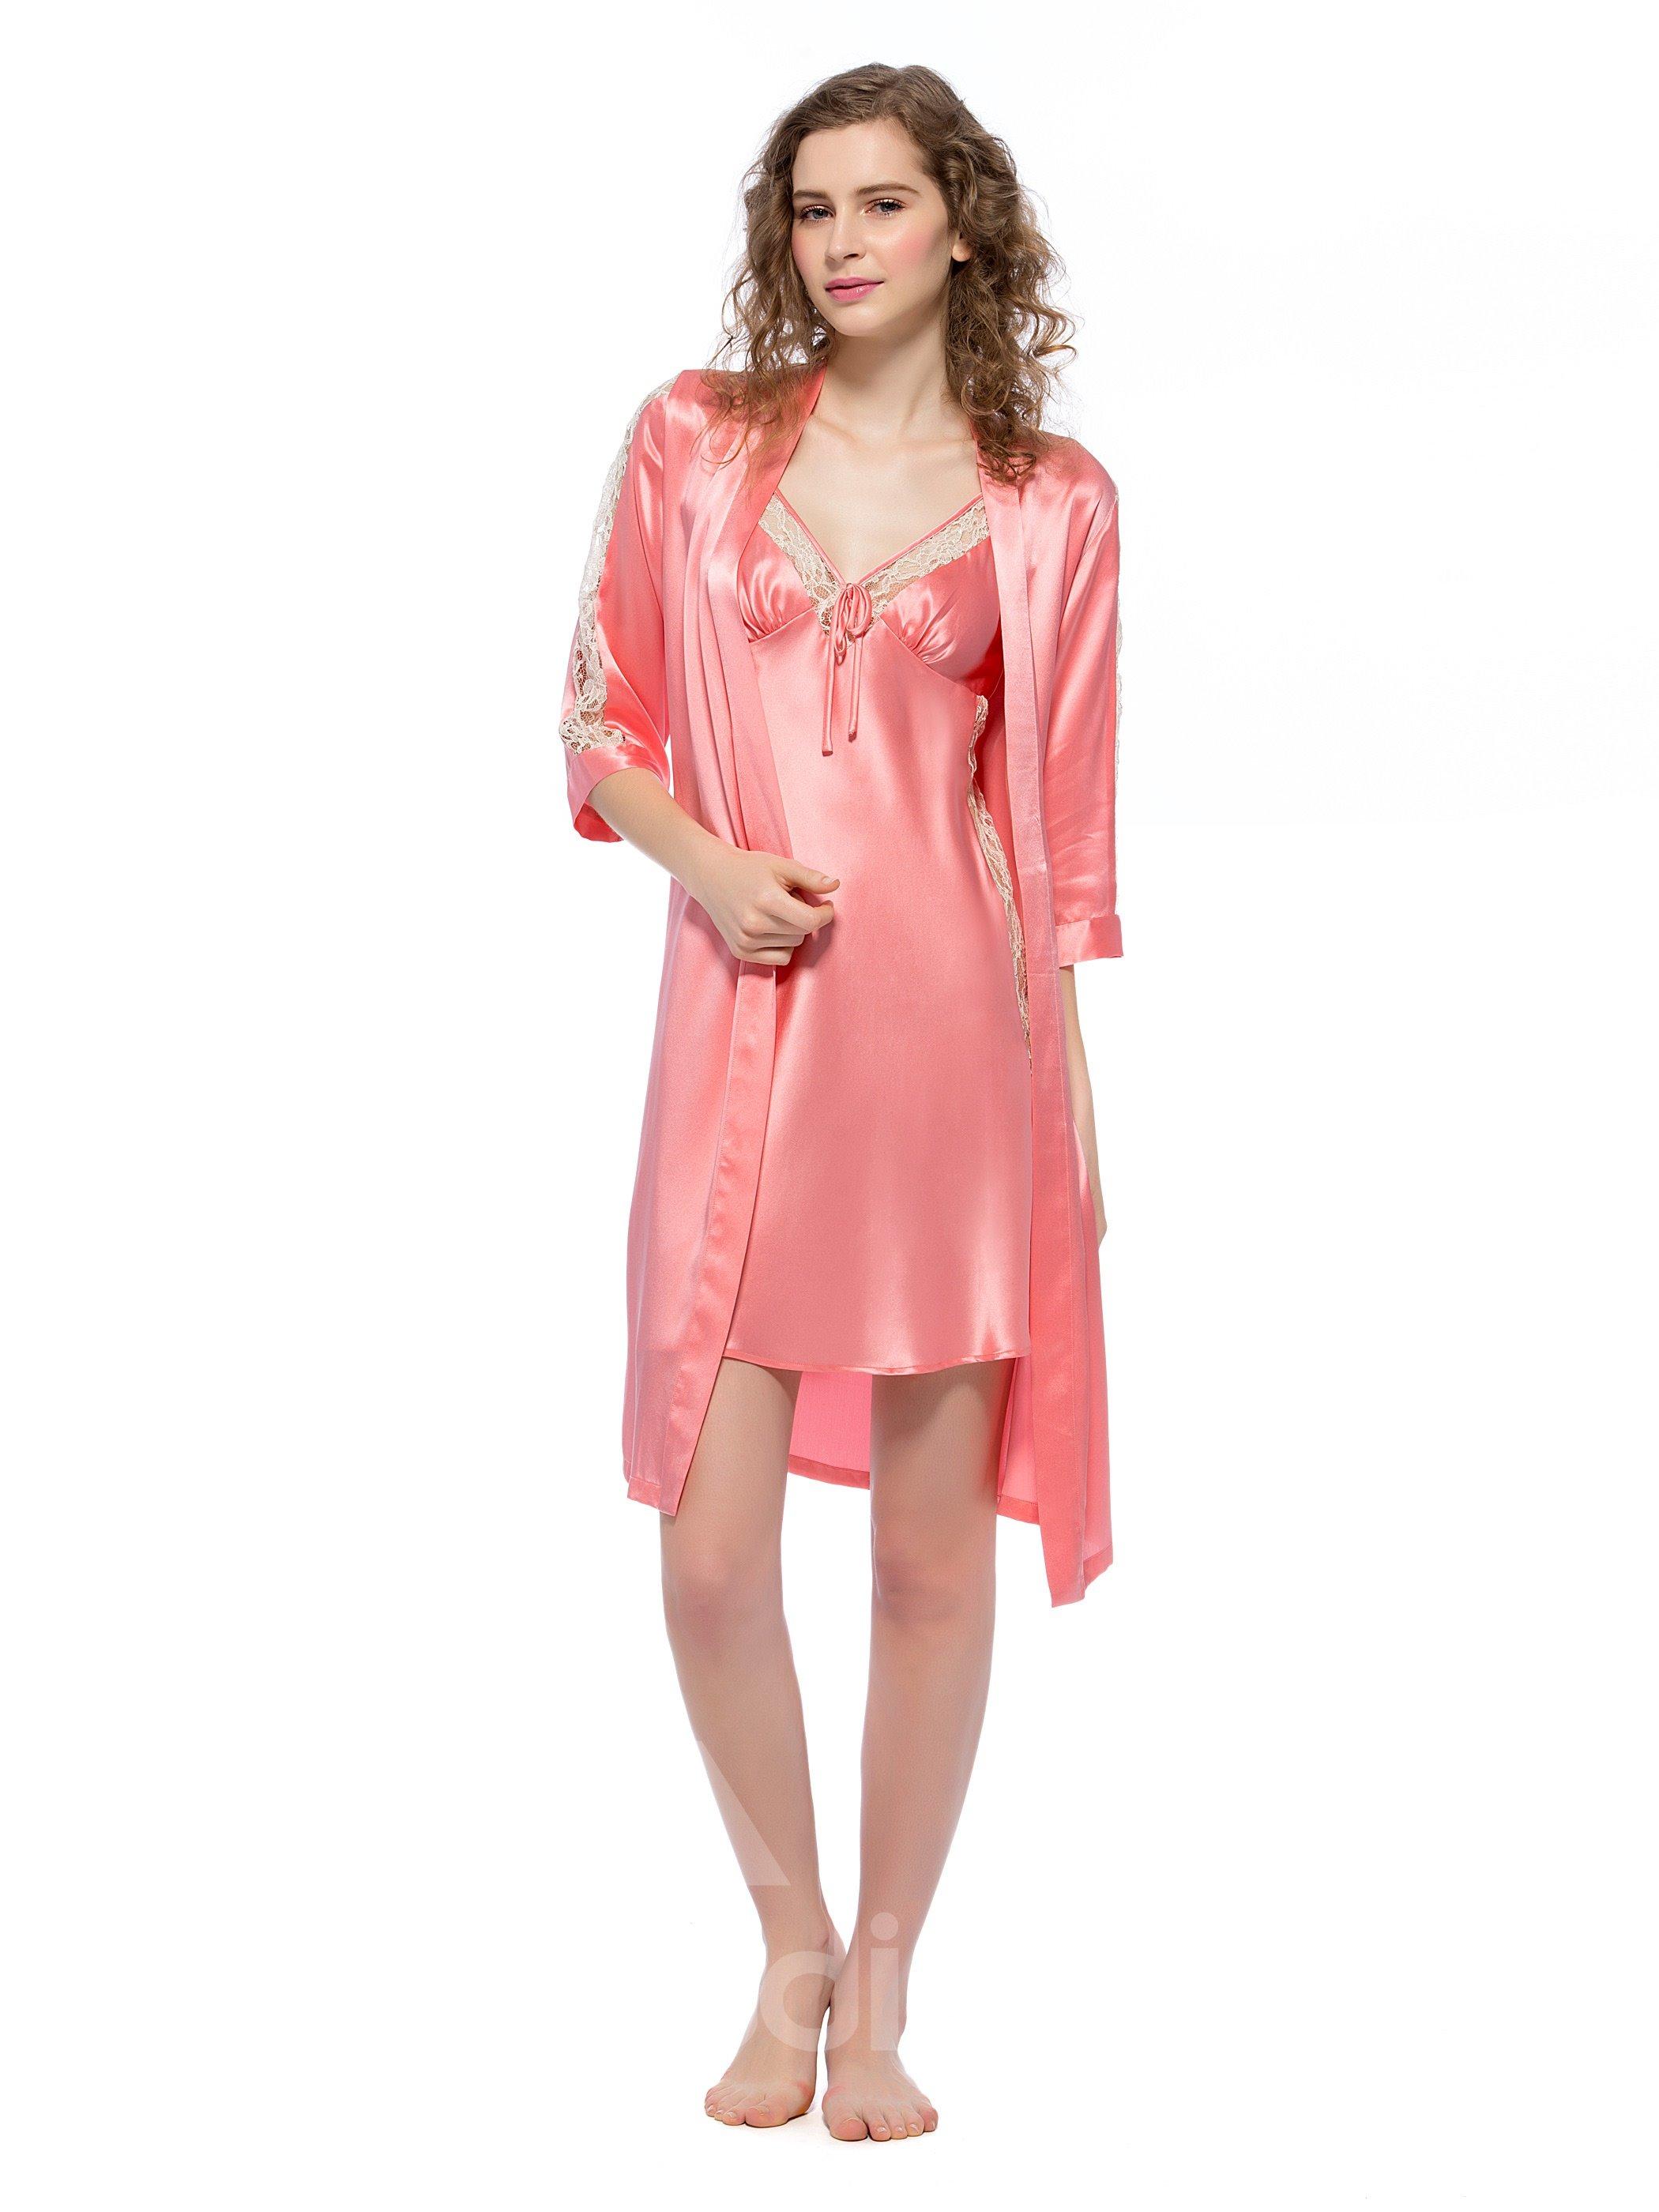 Elegant Lace Silk Robe and Chemises Sets